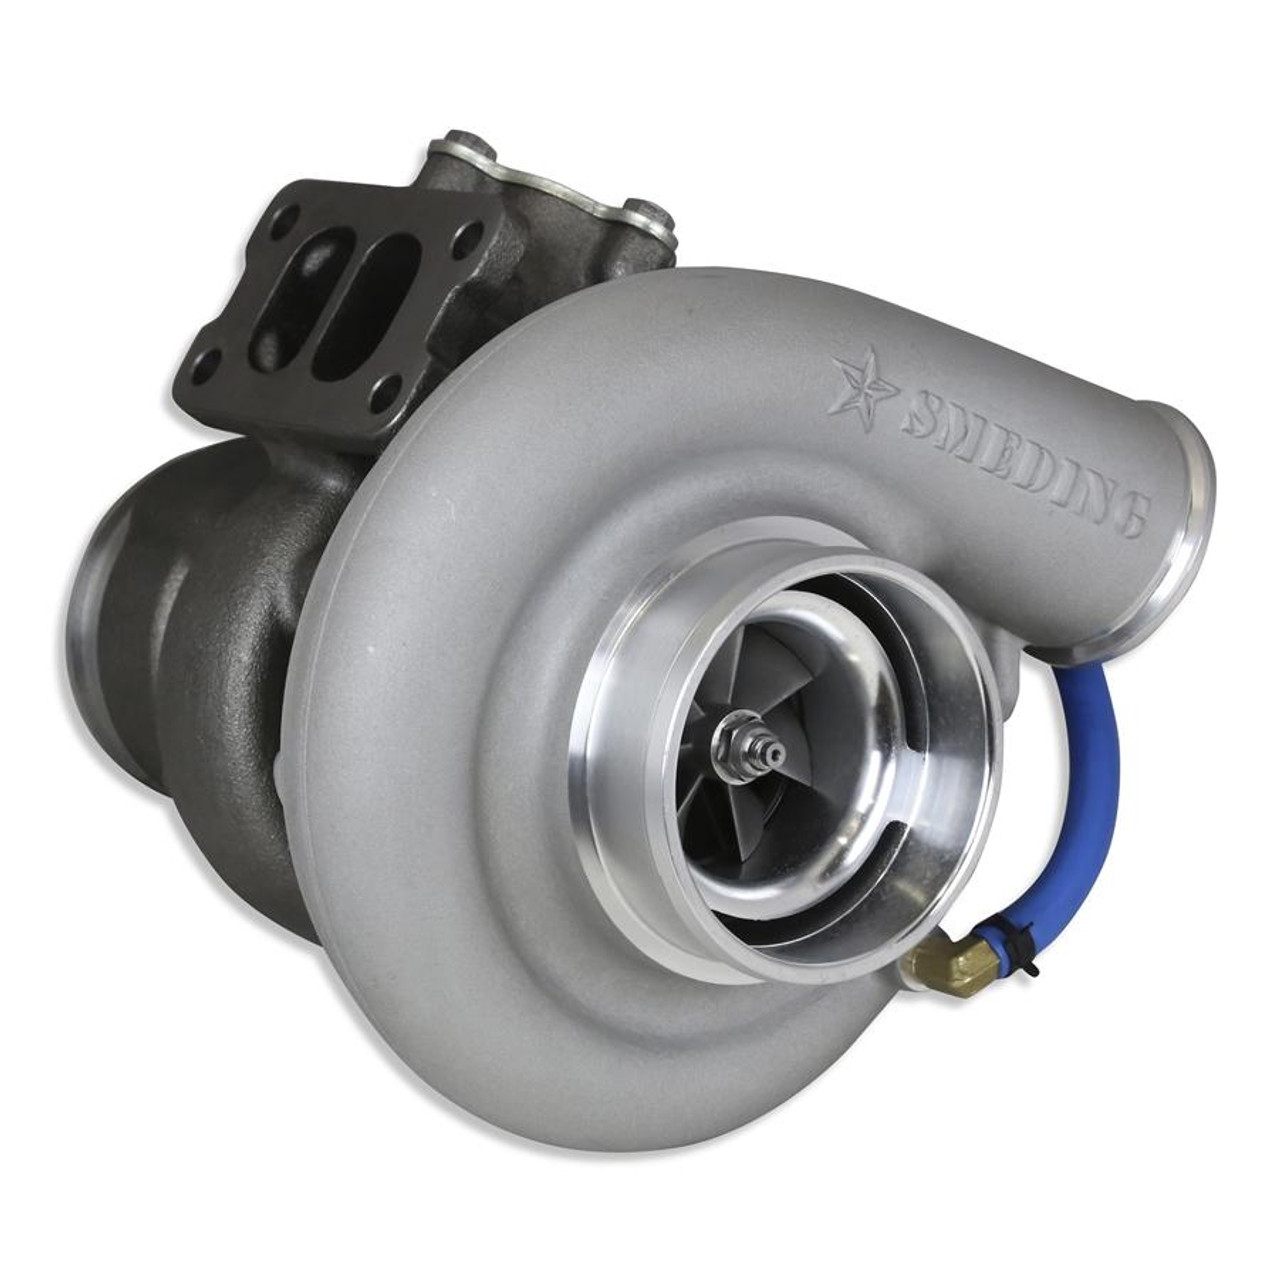 Smeding Diesel S364.5 Billet Drop in Turbo